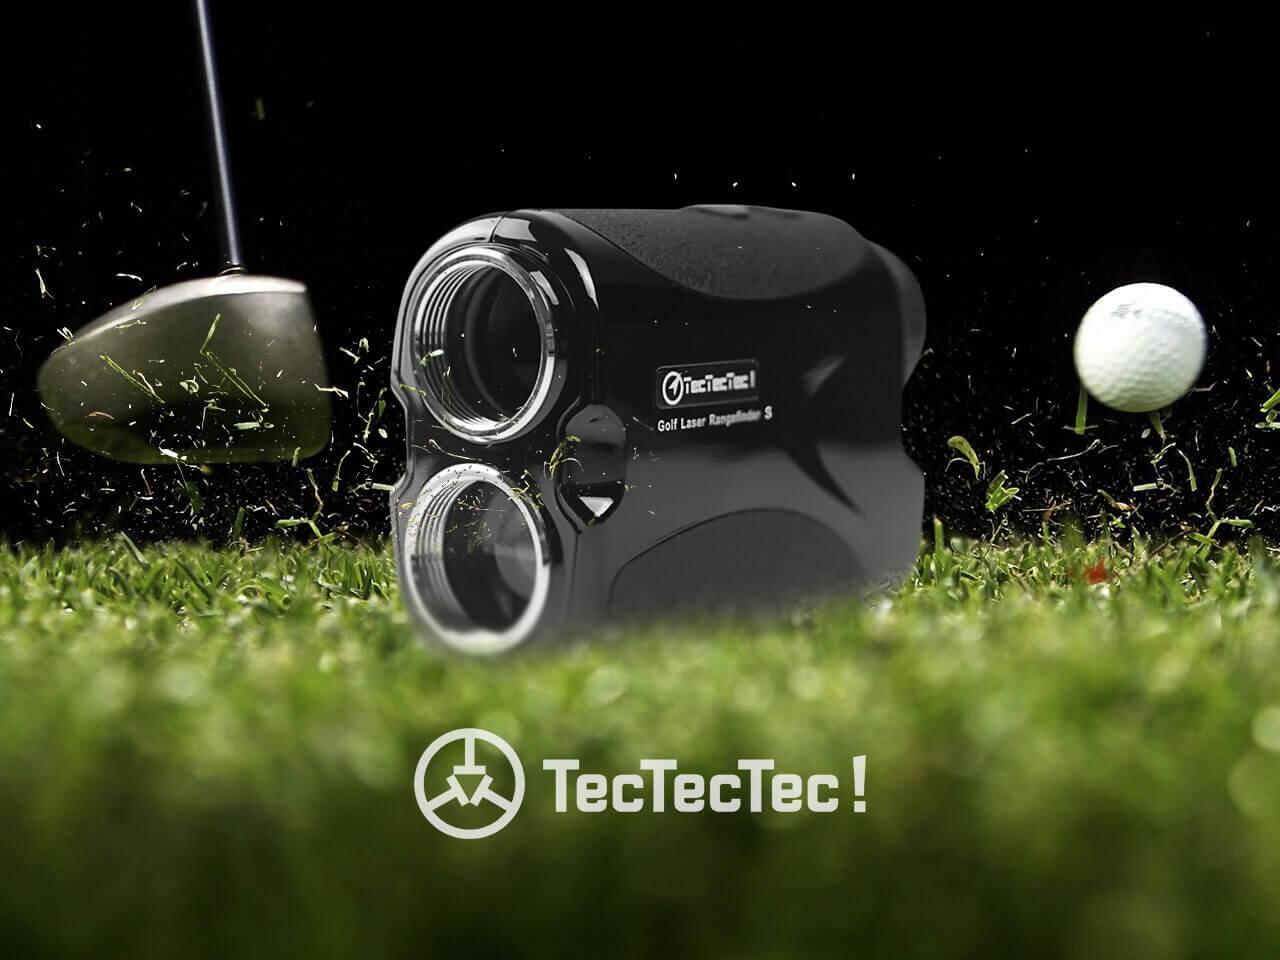 TecTecTec Golf Rangefinder VPRO500S Fast-Measuring Technology